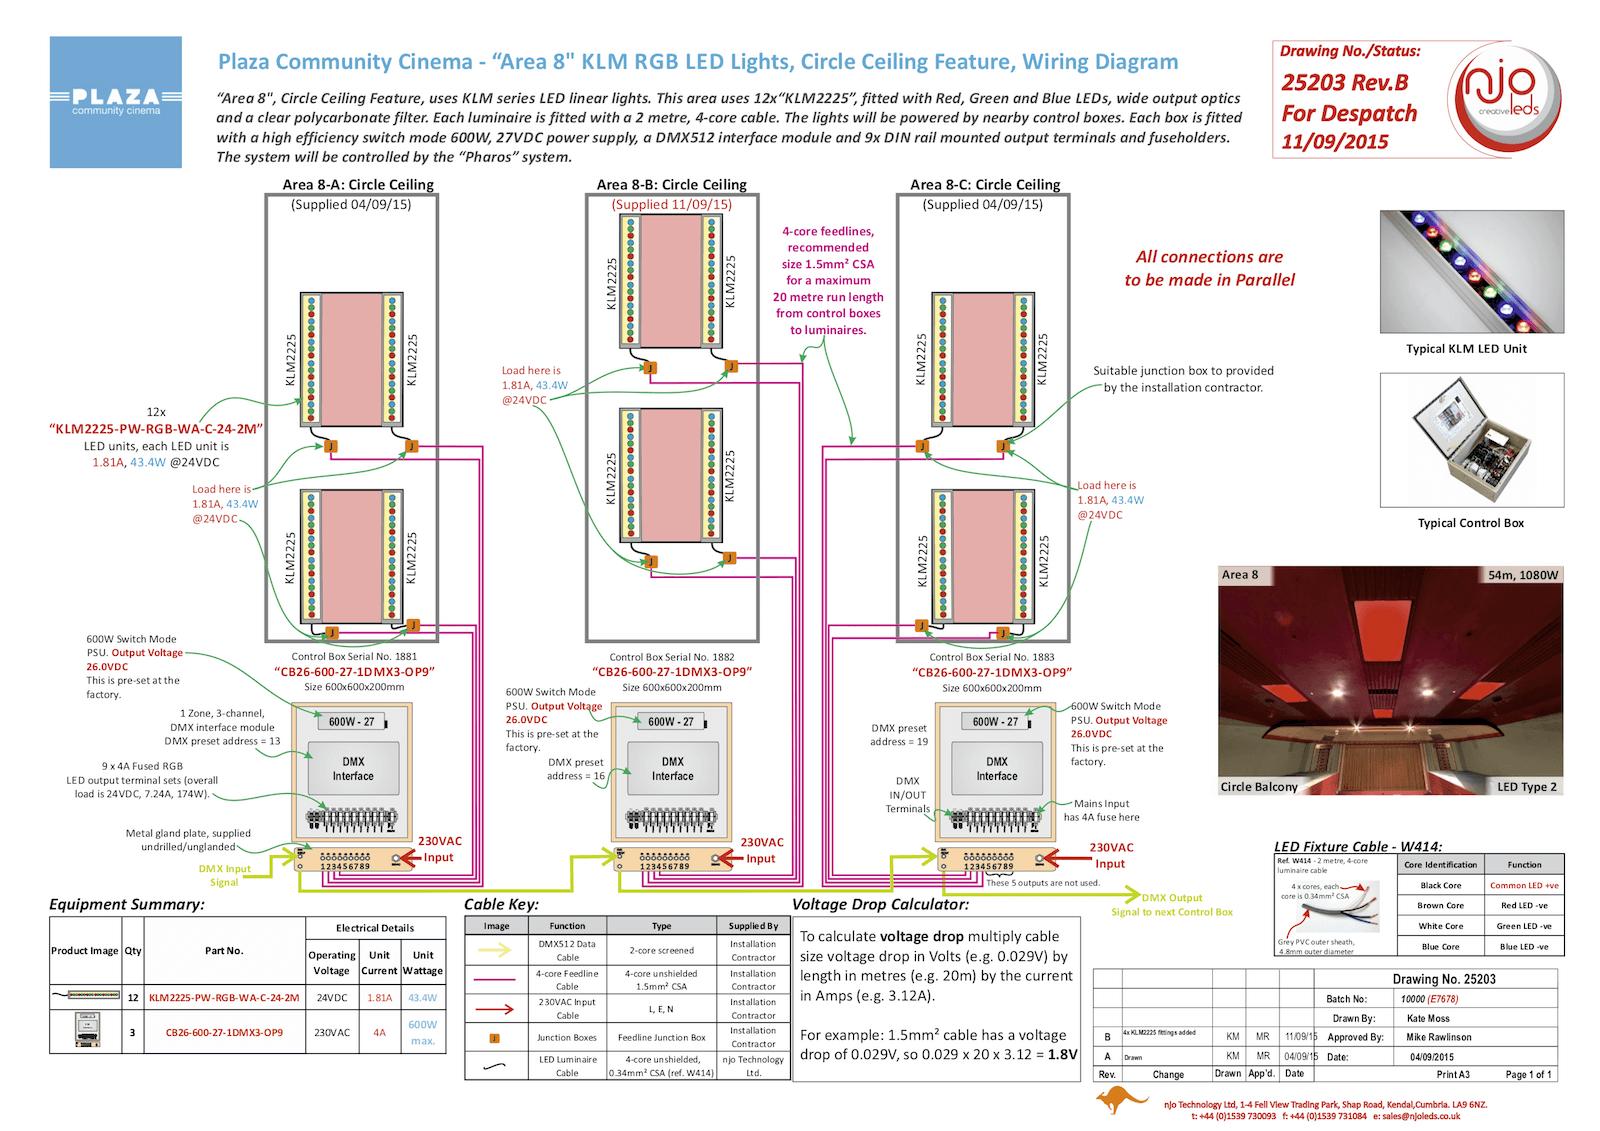 njo Plaza Community Cinema Typical Wiring Diagram